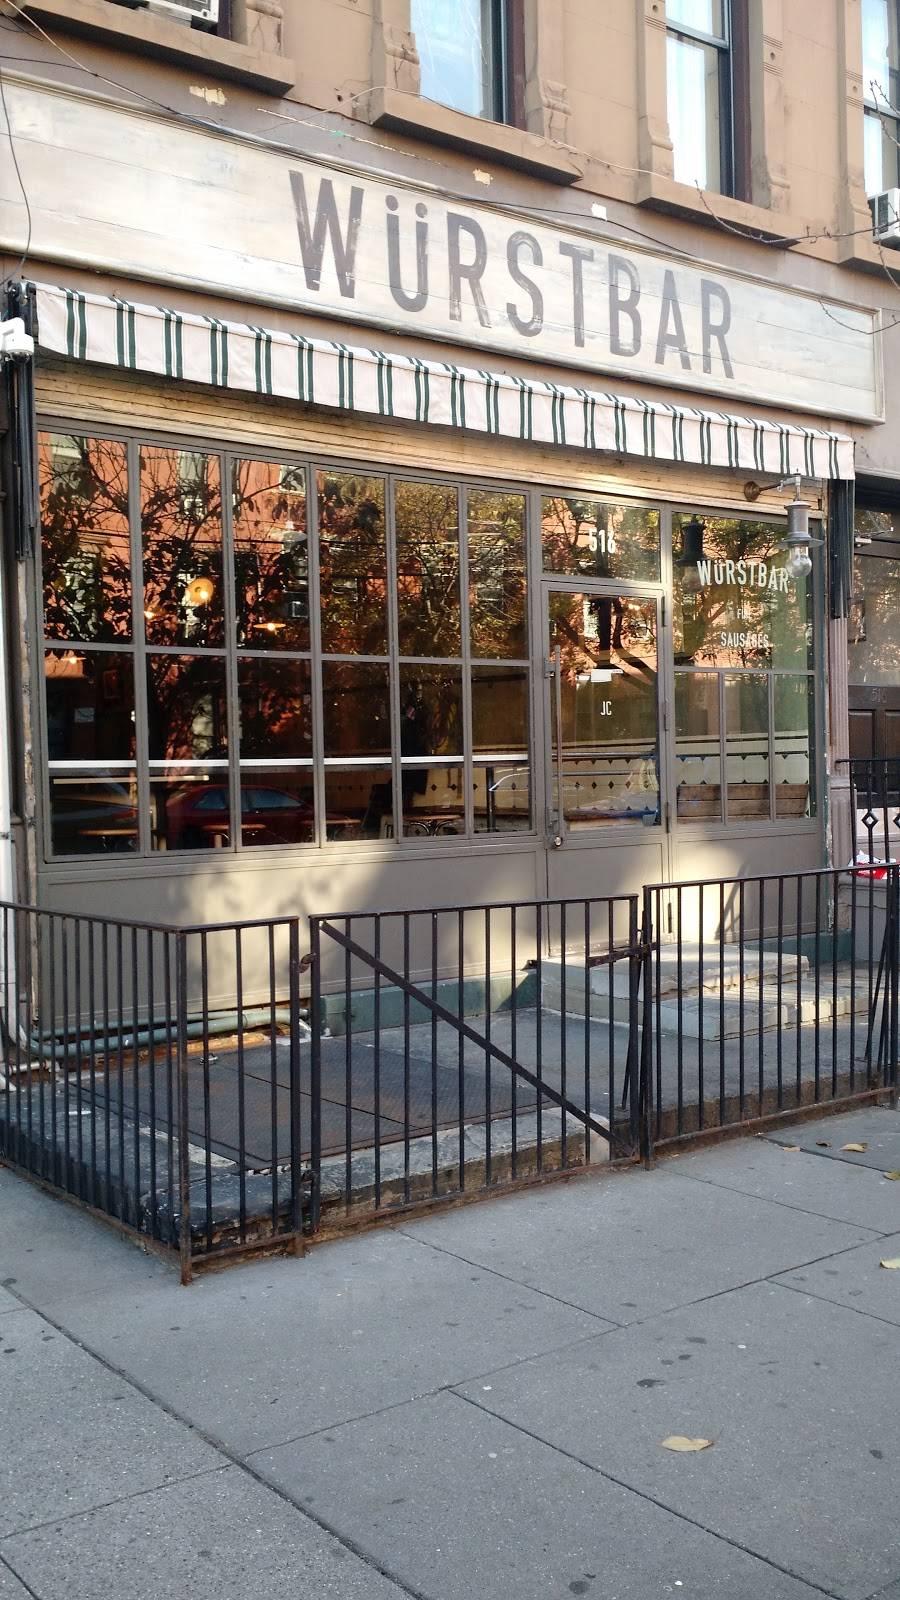 WÜRSTBAR   restaurant   516 Jersey Ave, Jersey City, NJ 07302, USA   2014798396 OR +1 201-479-8396